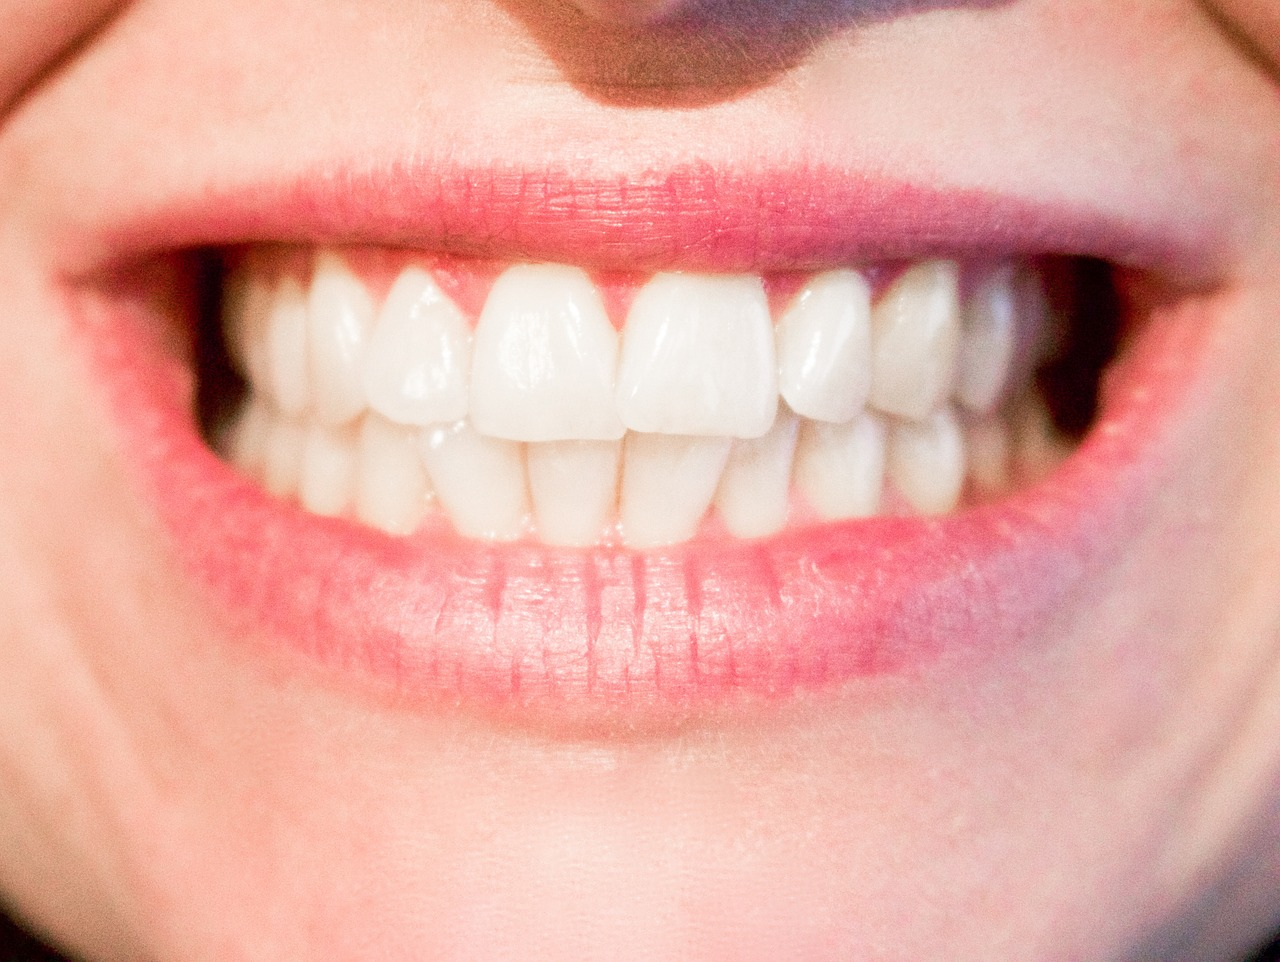 Šta sve oštećuje zubnu gleđ?